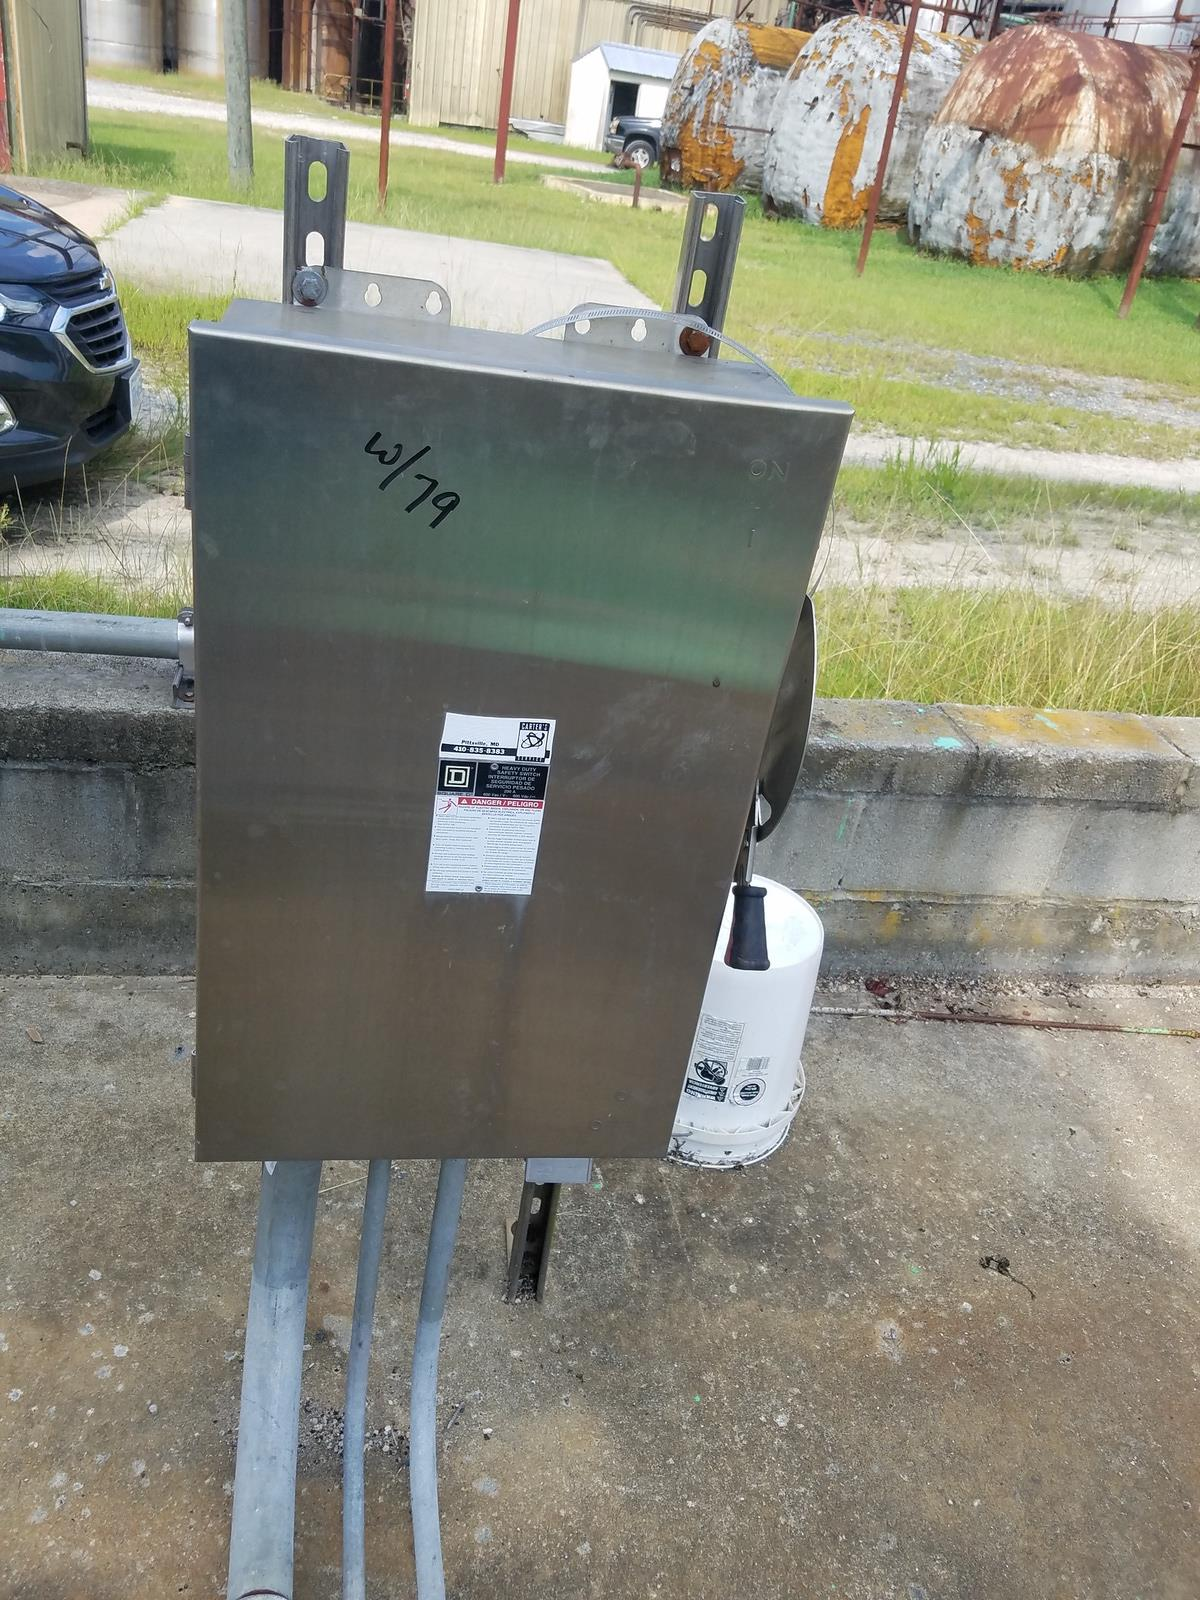 Goulds 6X8-14H Centrifugal Pump, M# 3410, S/N Q204H823, W/ Toshiba 100 HP Electr   Rig Fee: $1000 - Image 4 of 4